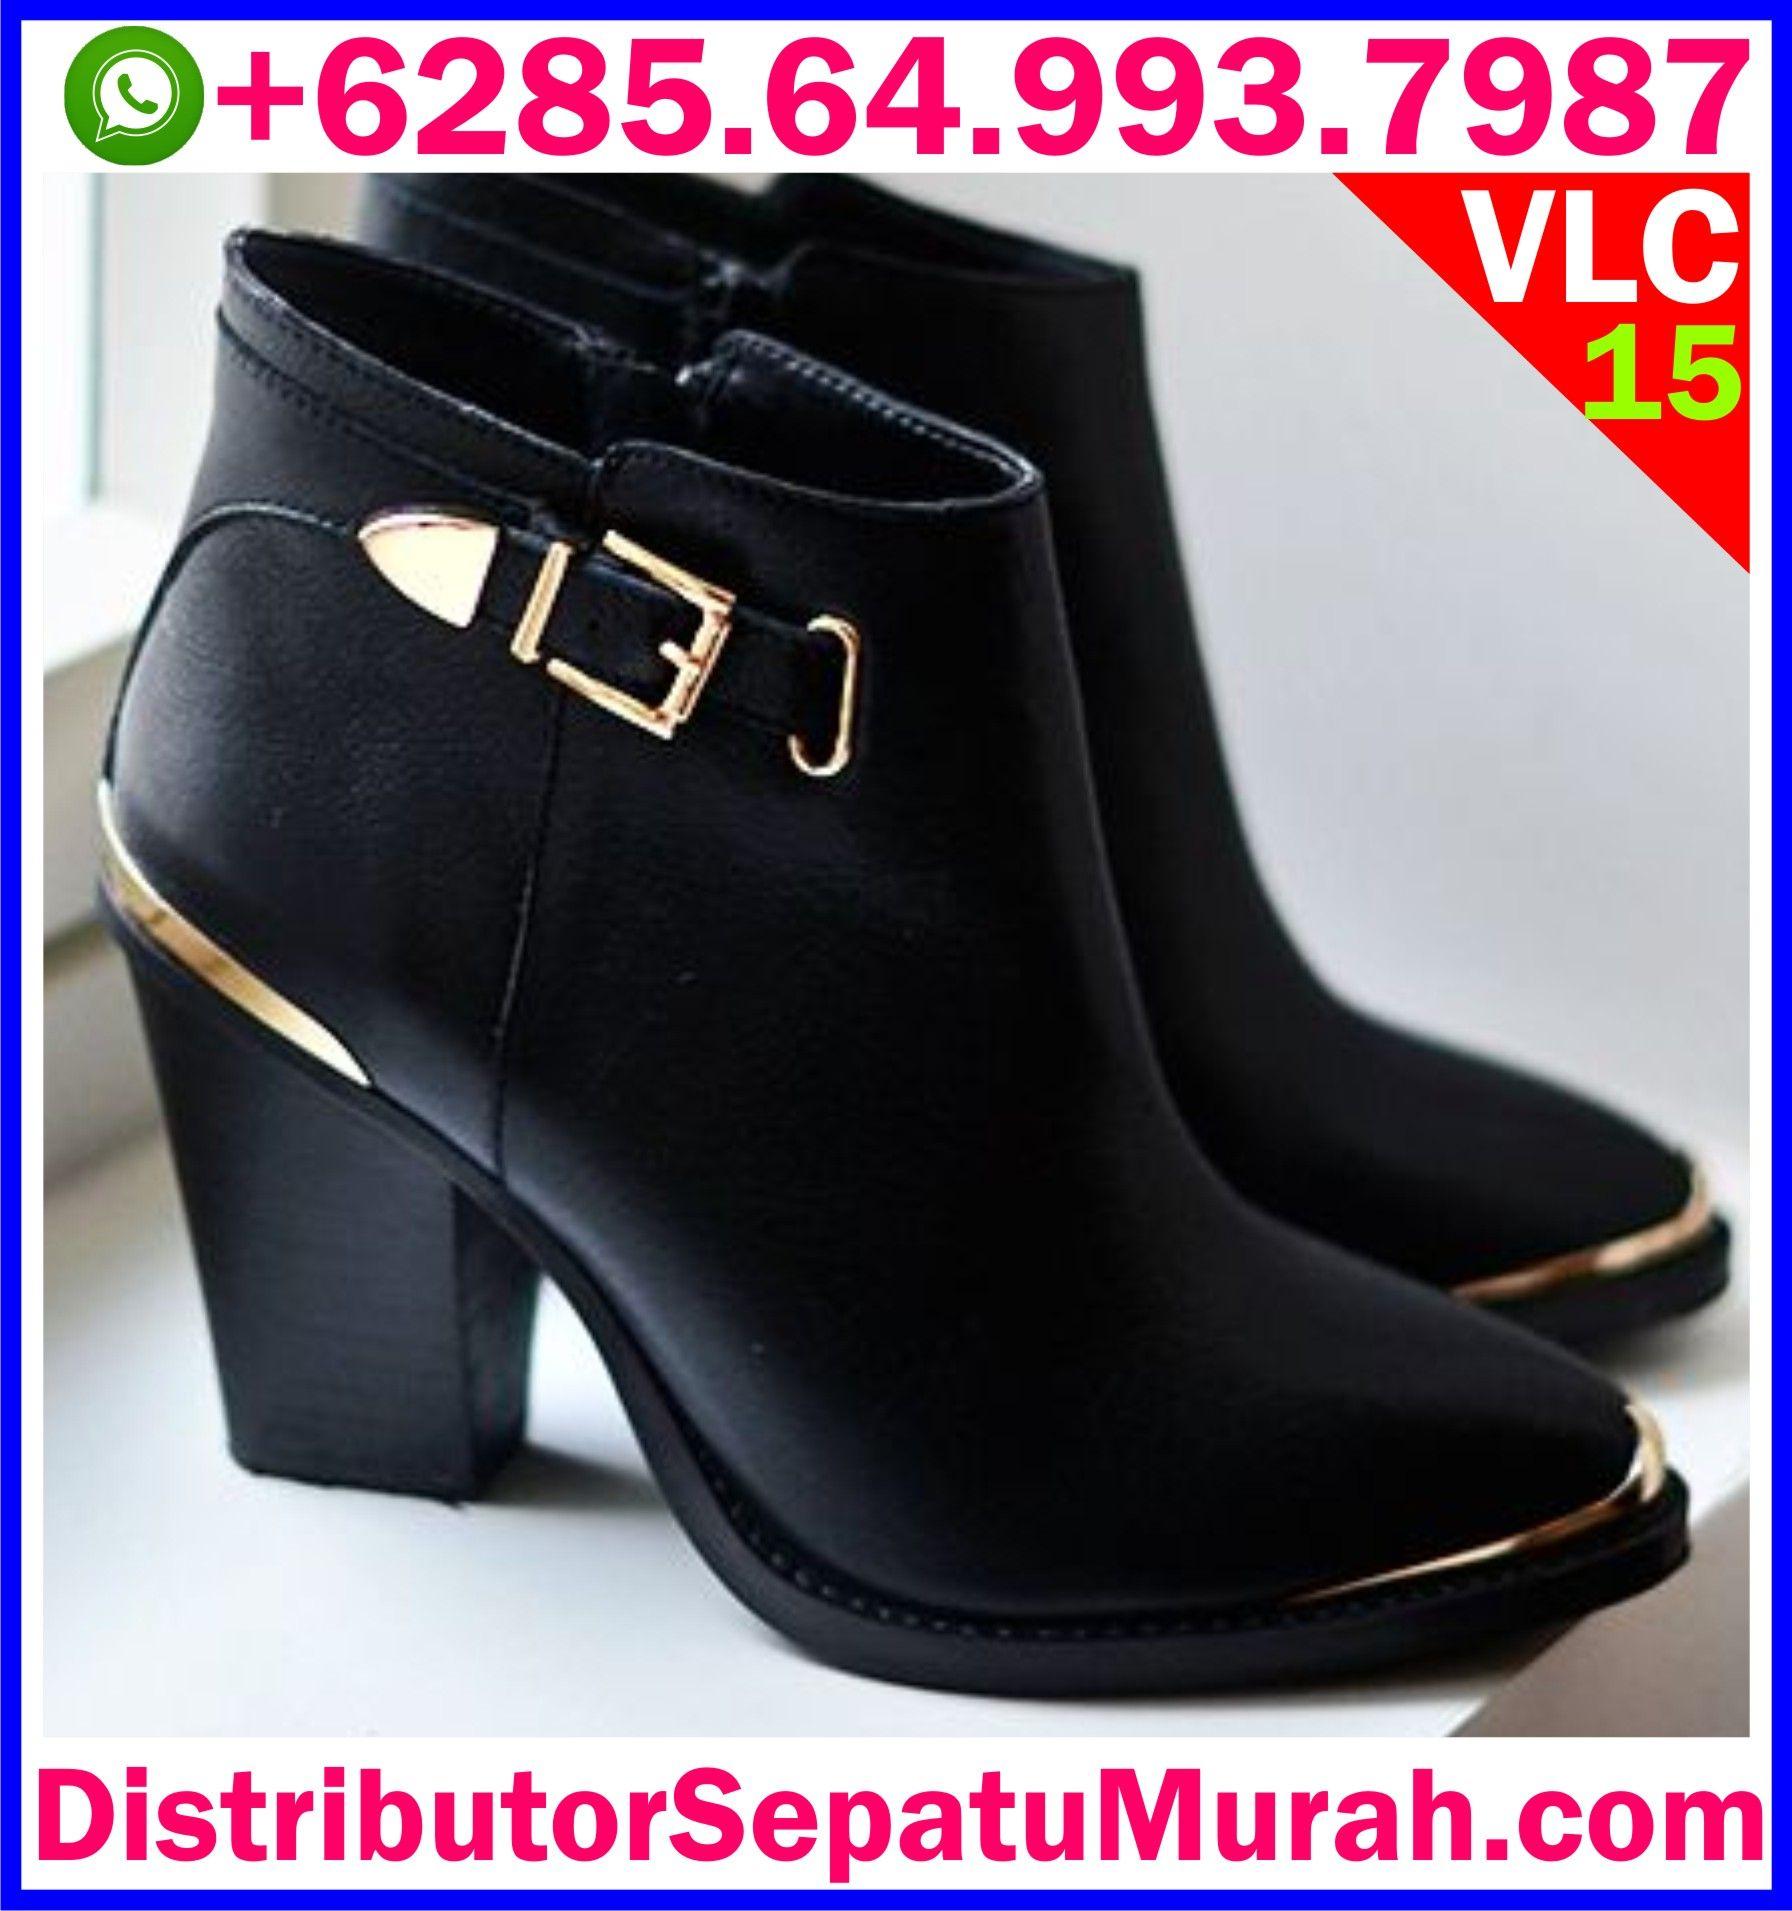 Sepatu Kulit Sepatu Kulit Pria Sepatu Kulit Wanita Sepatu Kulit Asli Sepatu